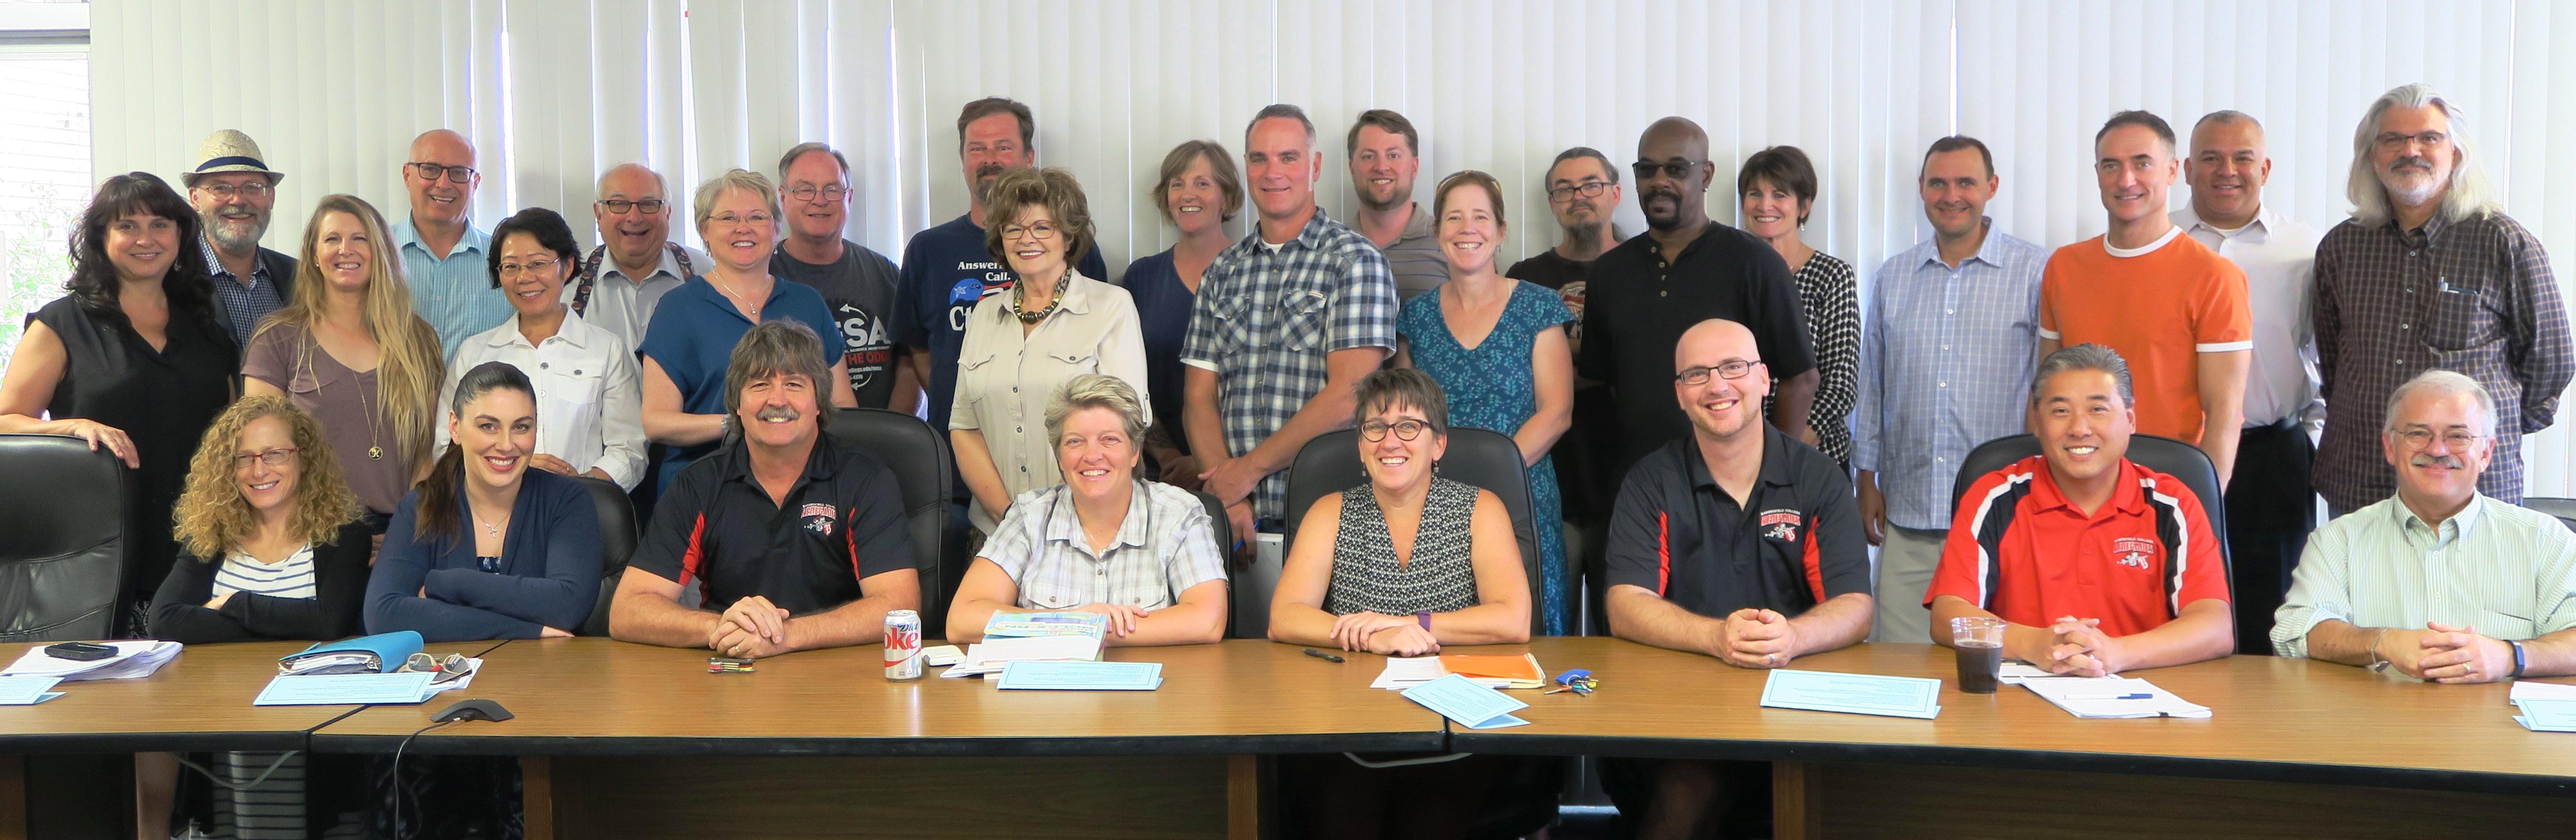 16-17 Academic Senate Group Photo